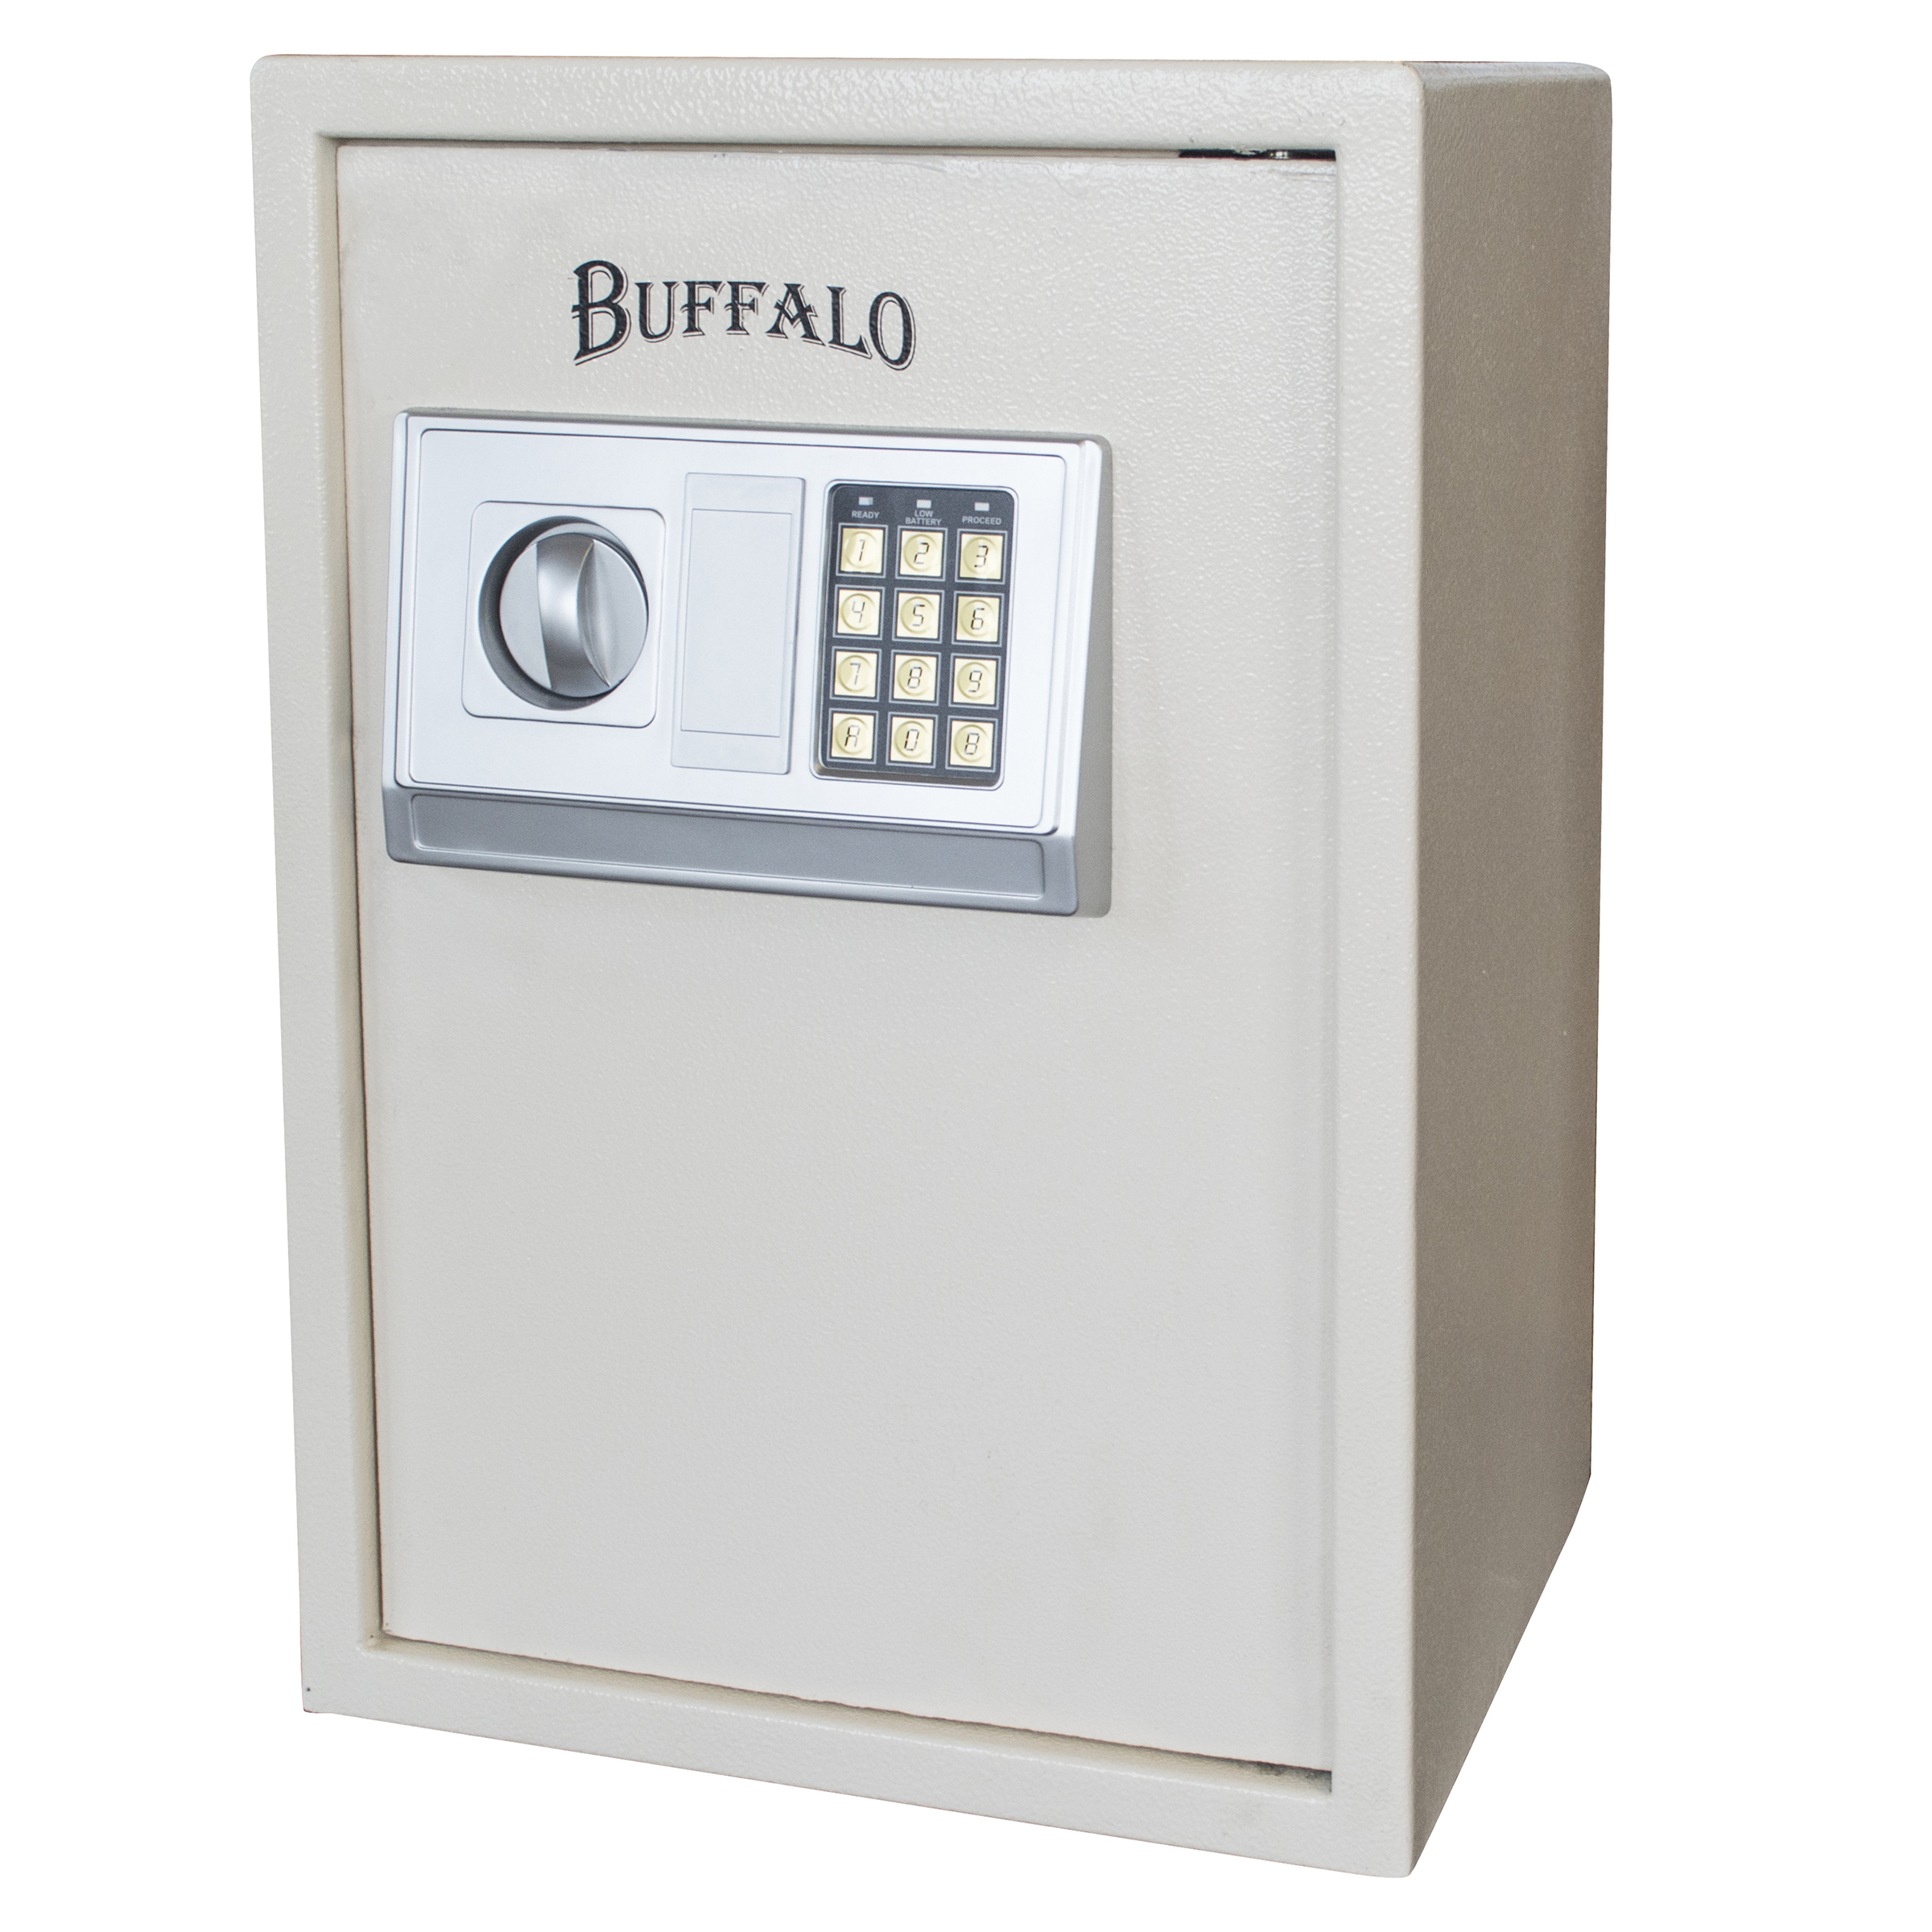 Buffalo Outdoor Electronic Floor Safe - Beige